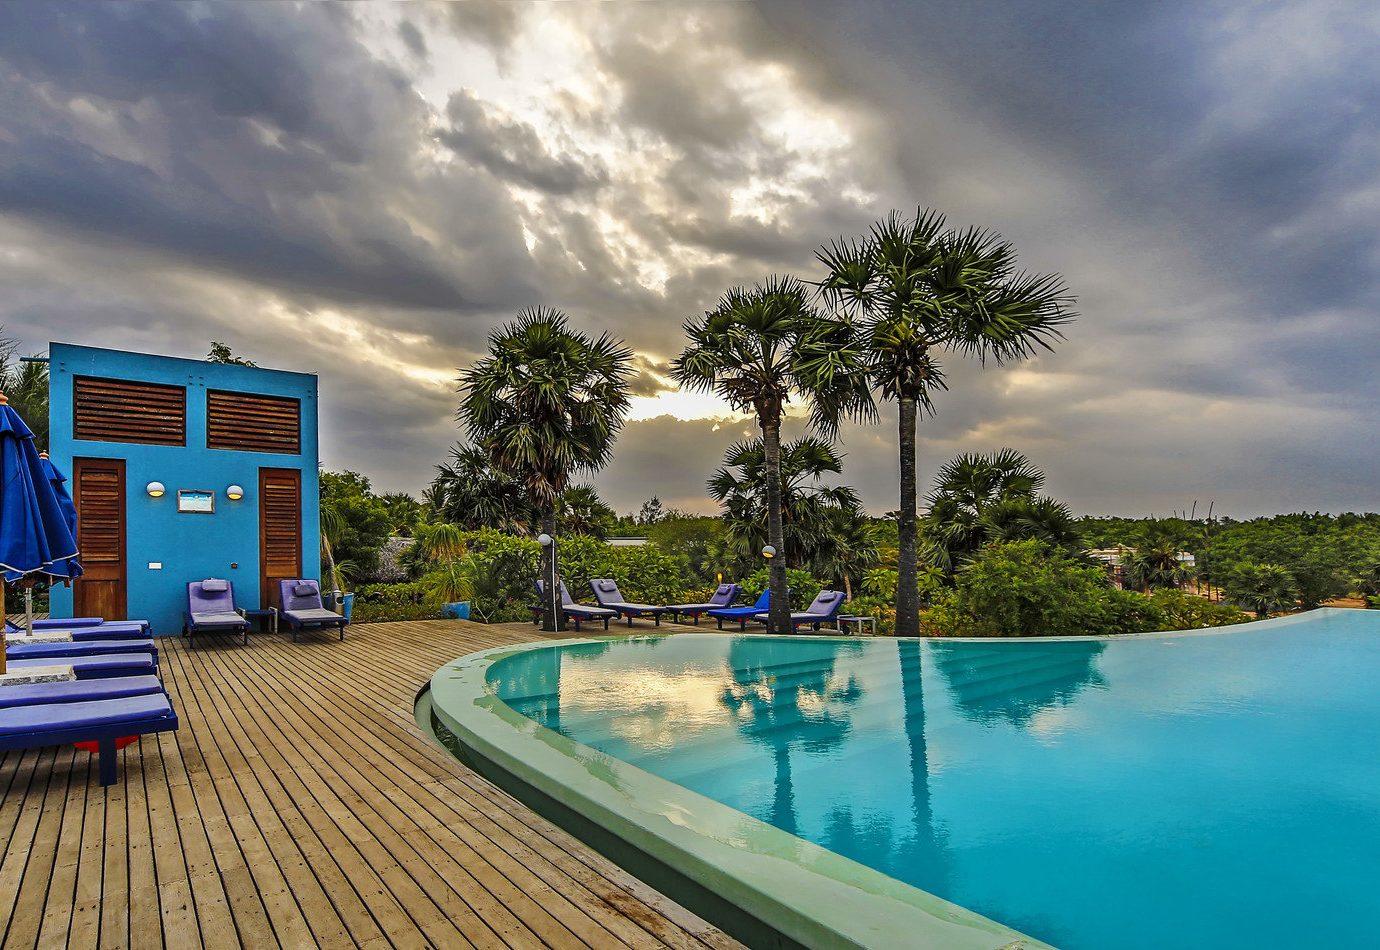 Hotels sky outdoor Beach swimming pool leisure property blue Resort estate vacation home real estate condominium Pool Villa backyard colorful Deck Boat shore